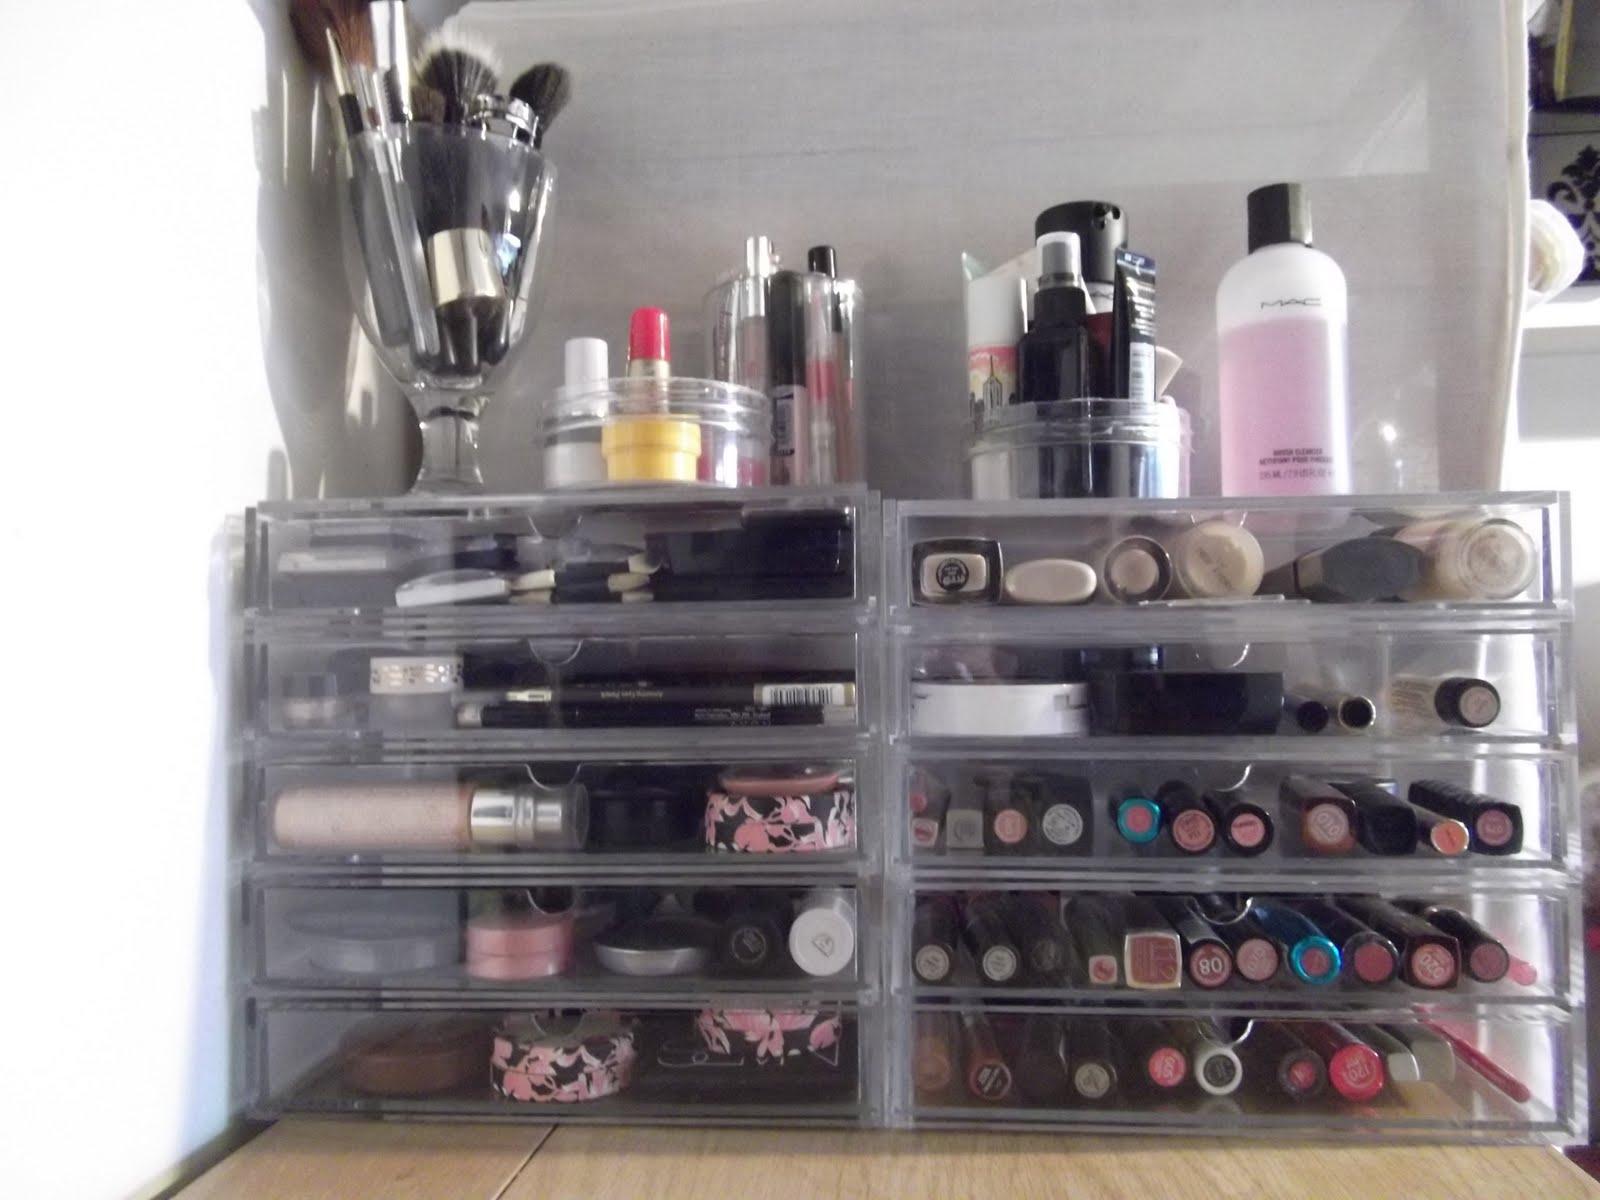 Http Wwwmujius Store Storage Acrylic Caseshtml  sc 1 st  Listitdallas & Acrylic Makeup Storage Muji - Listitdallas